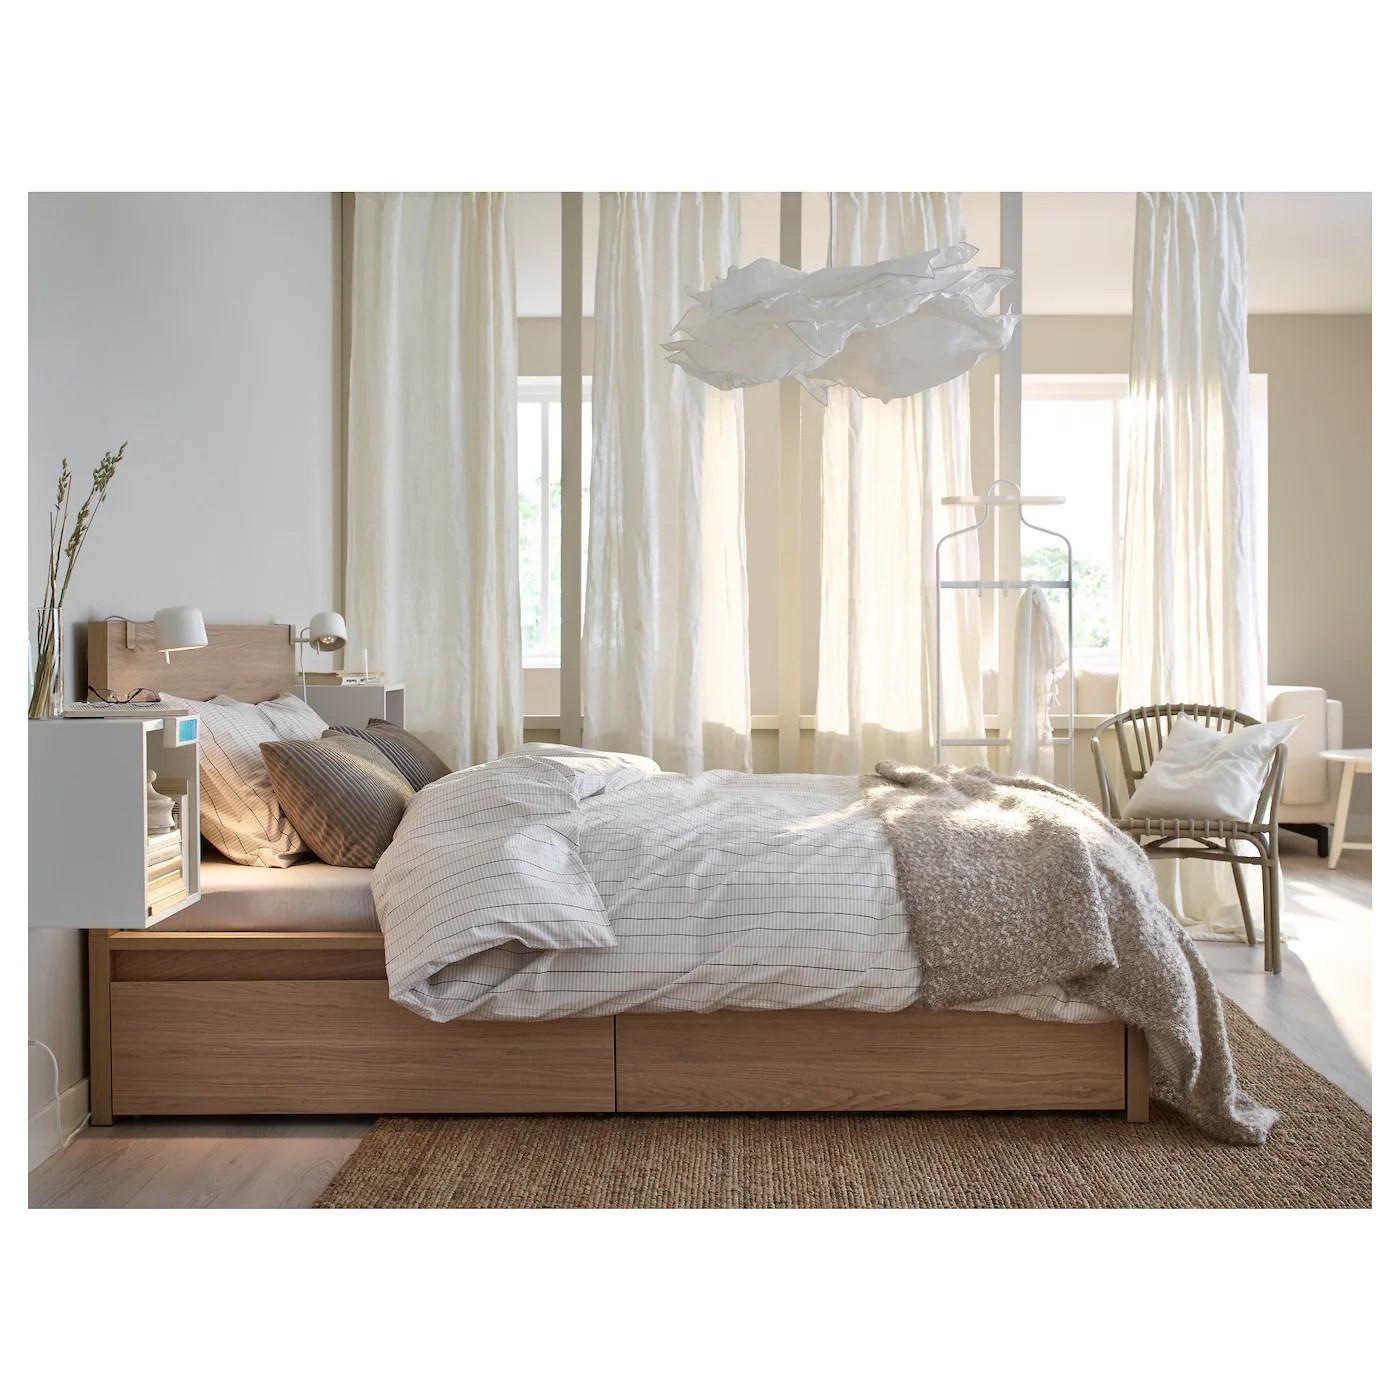 Ikea Schlafzimmer Lampe Reissverschluss Bettwasche Reparieren